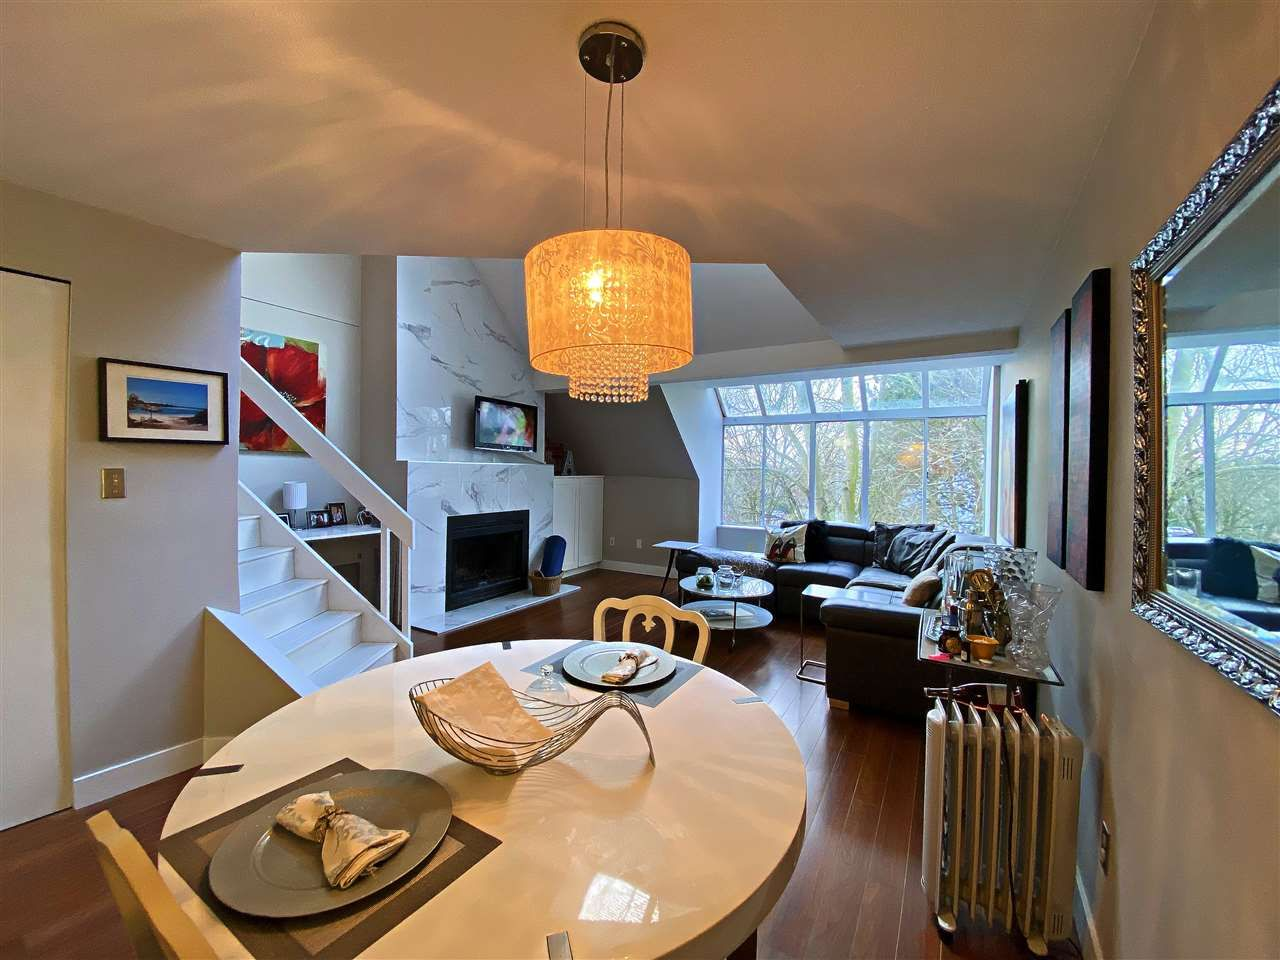 Main Photo: 312 7751 MINORU BOULEVARD in Richmond: Brighouse South Condo for sale : MLS®# R2529897